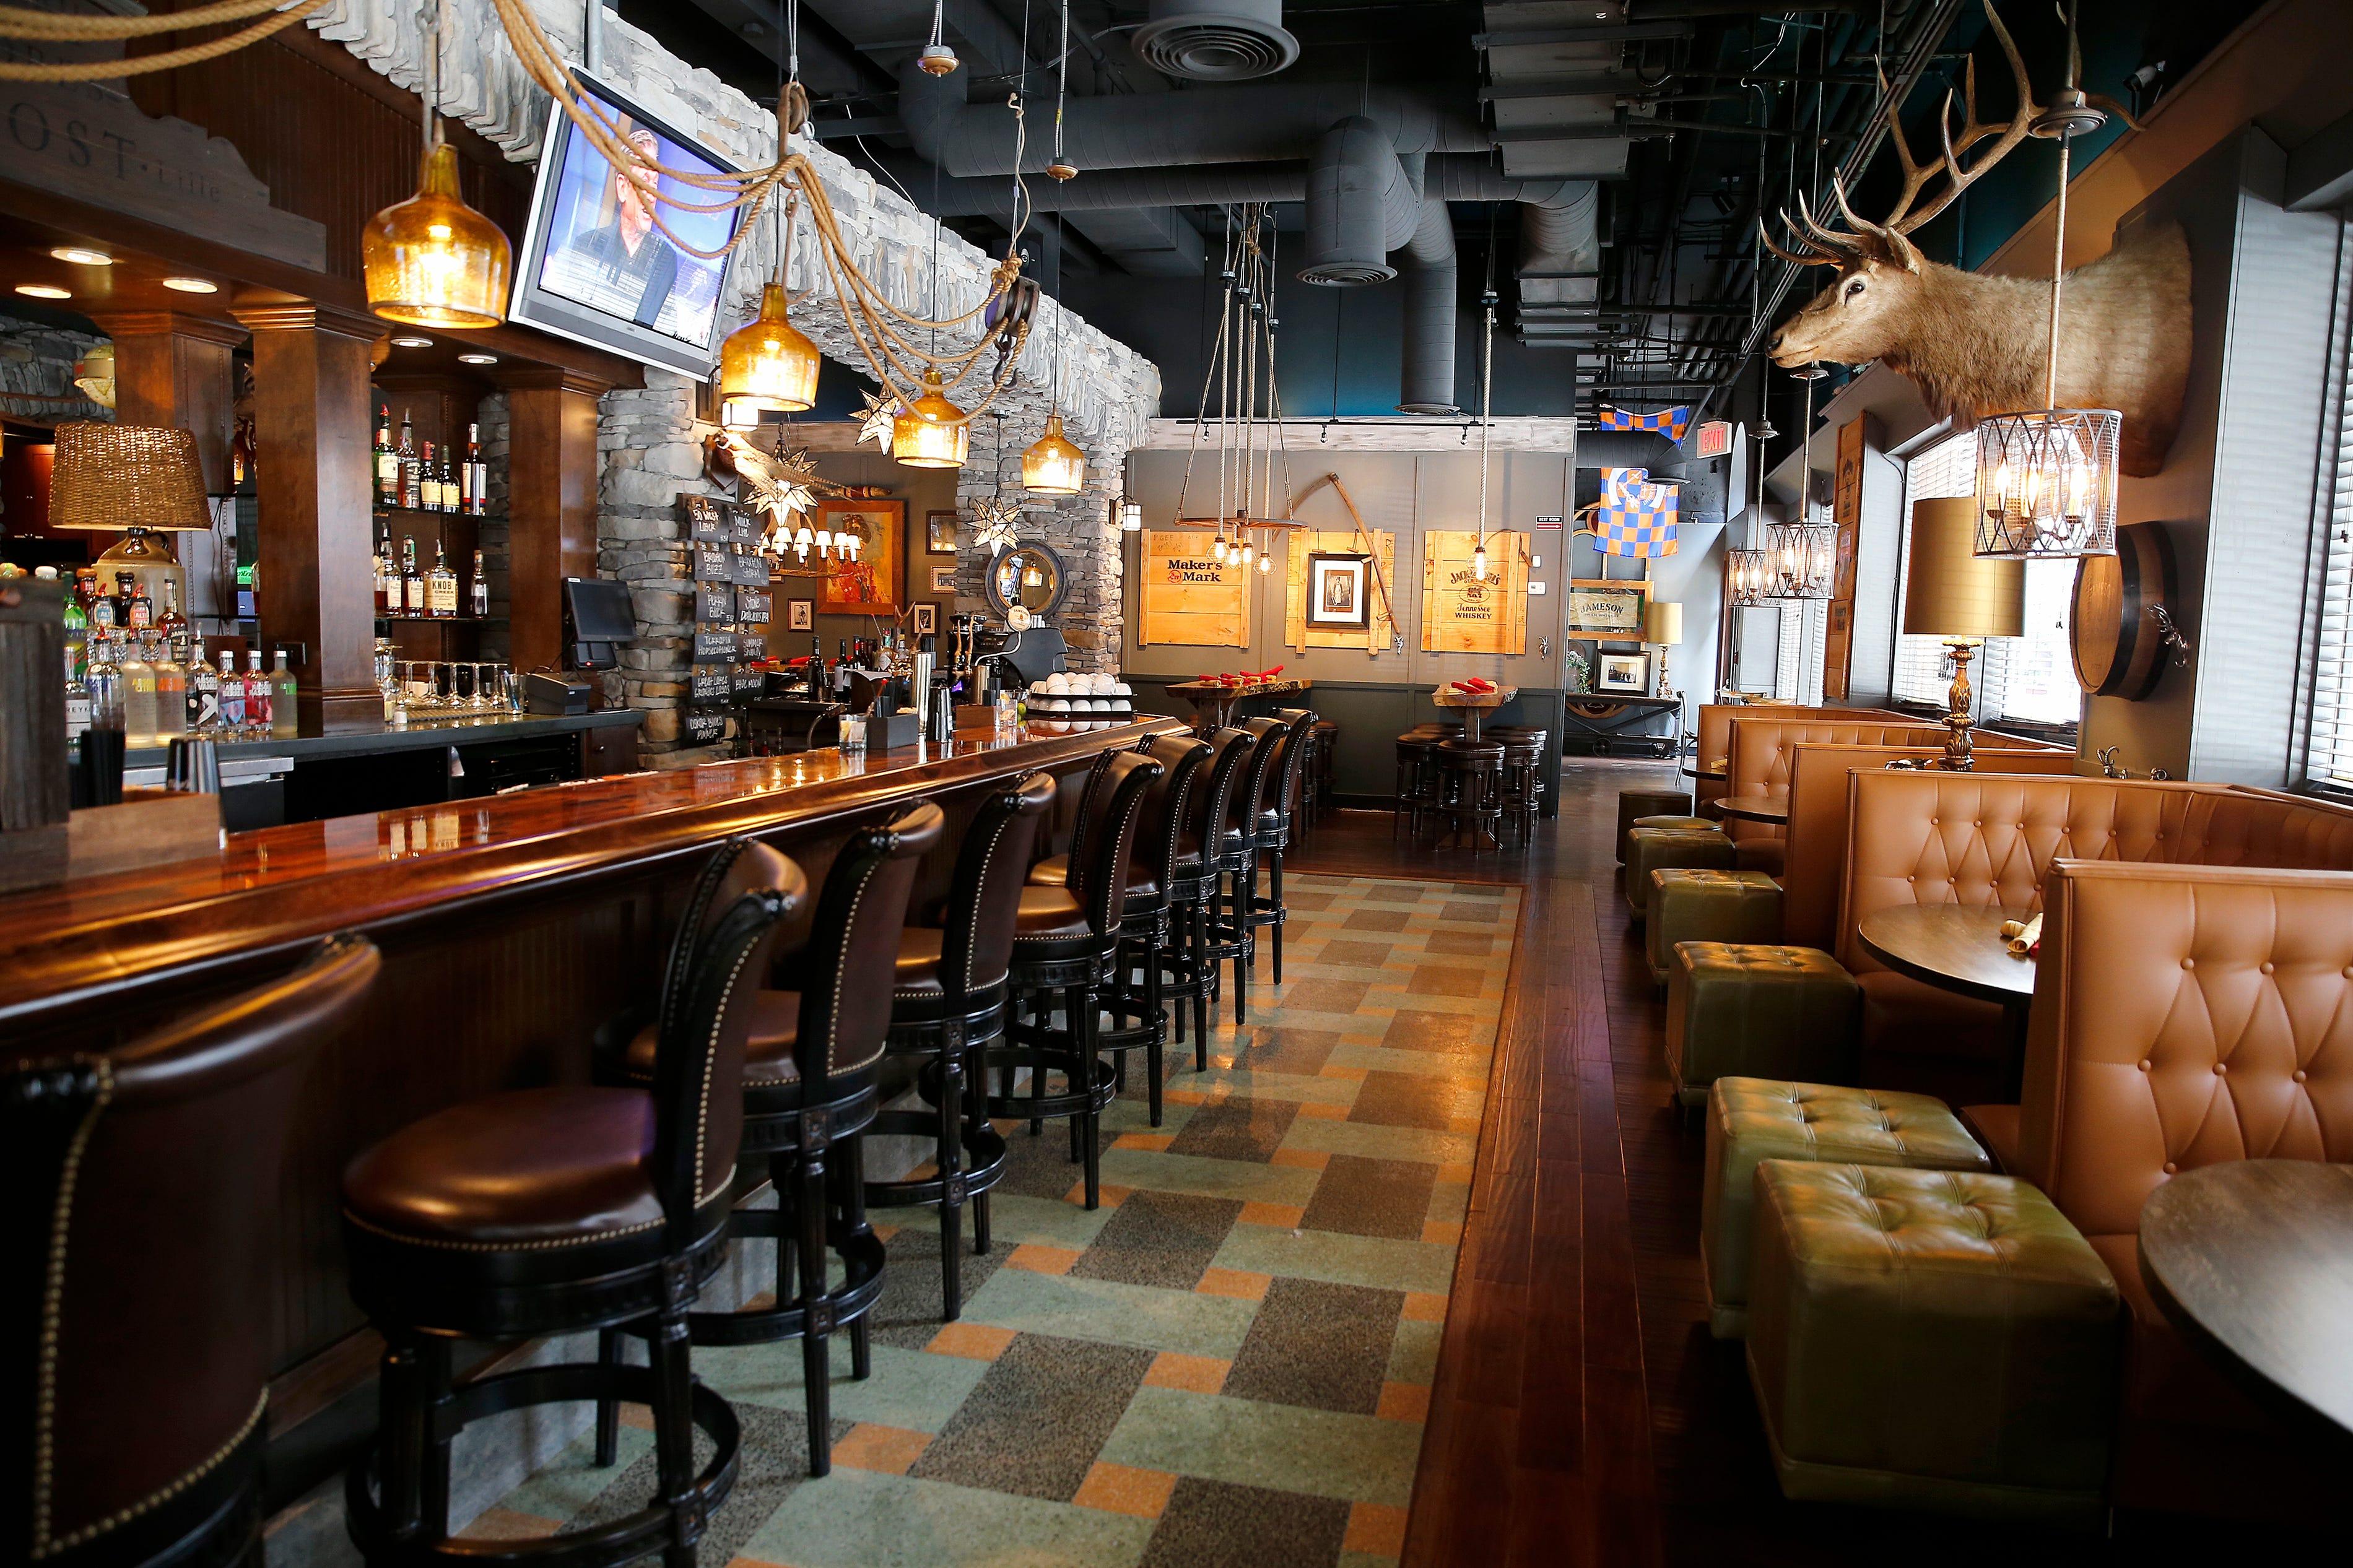 Review of Cincinnatiu0027s new restaurant Butcher